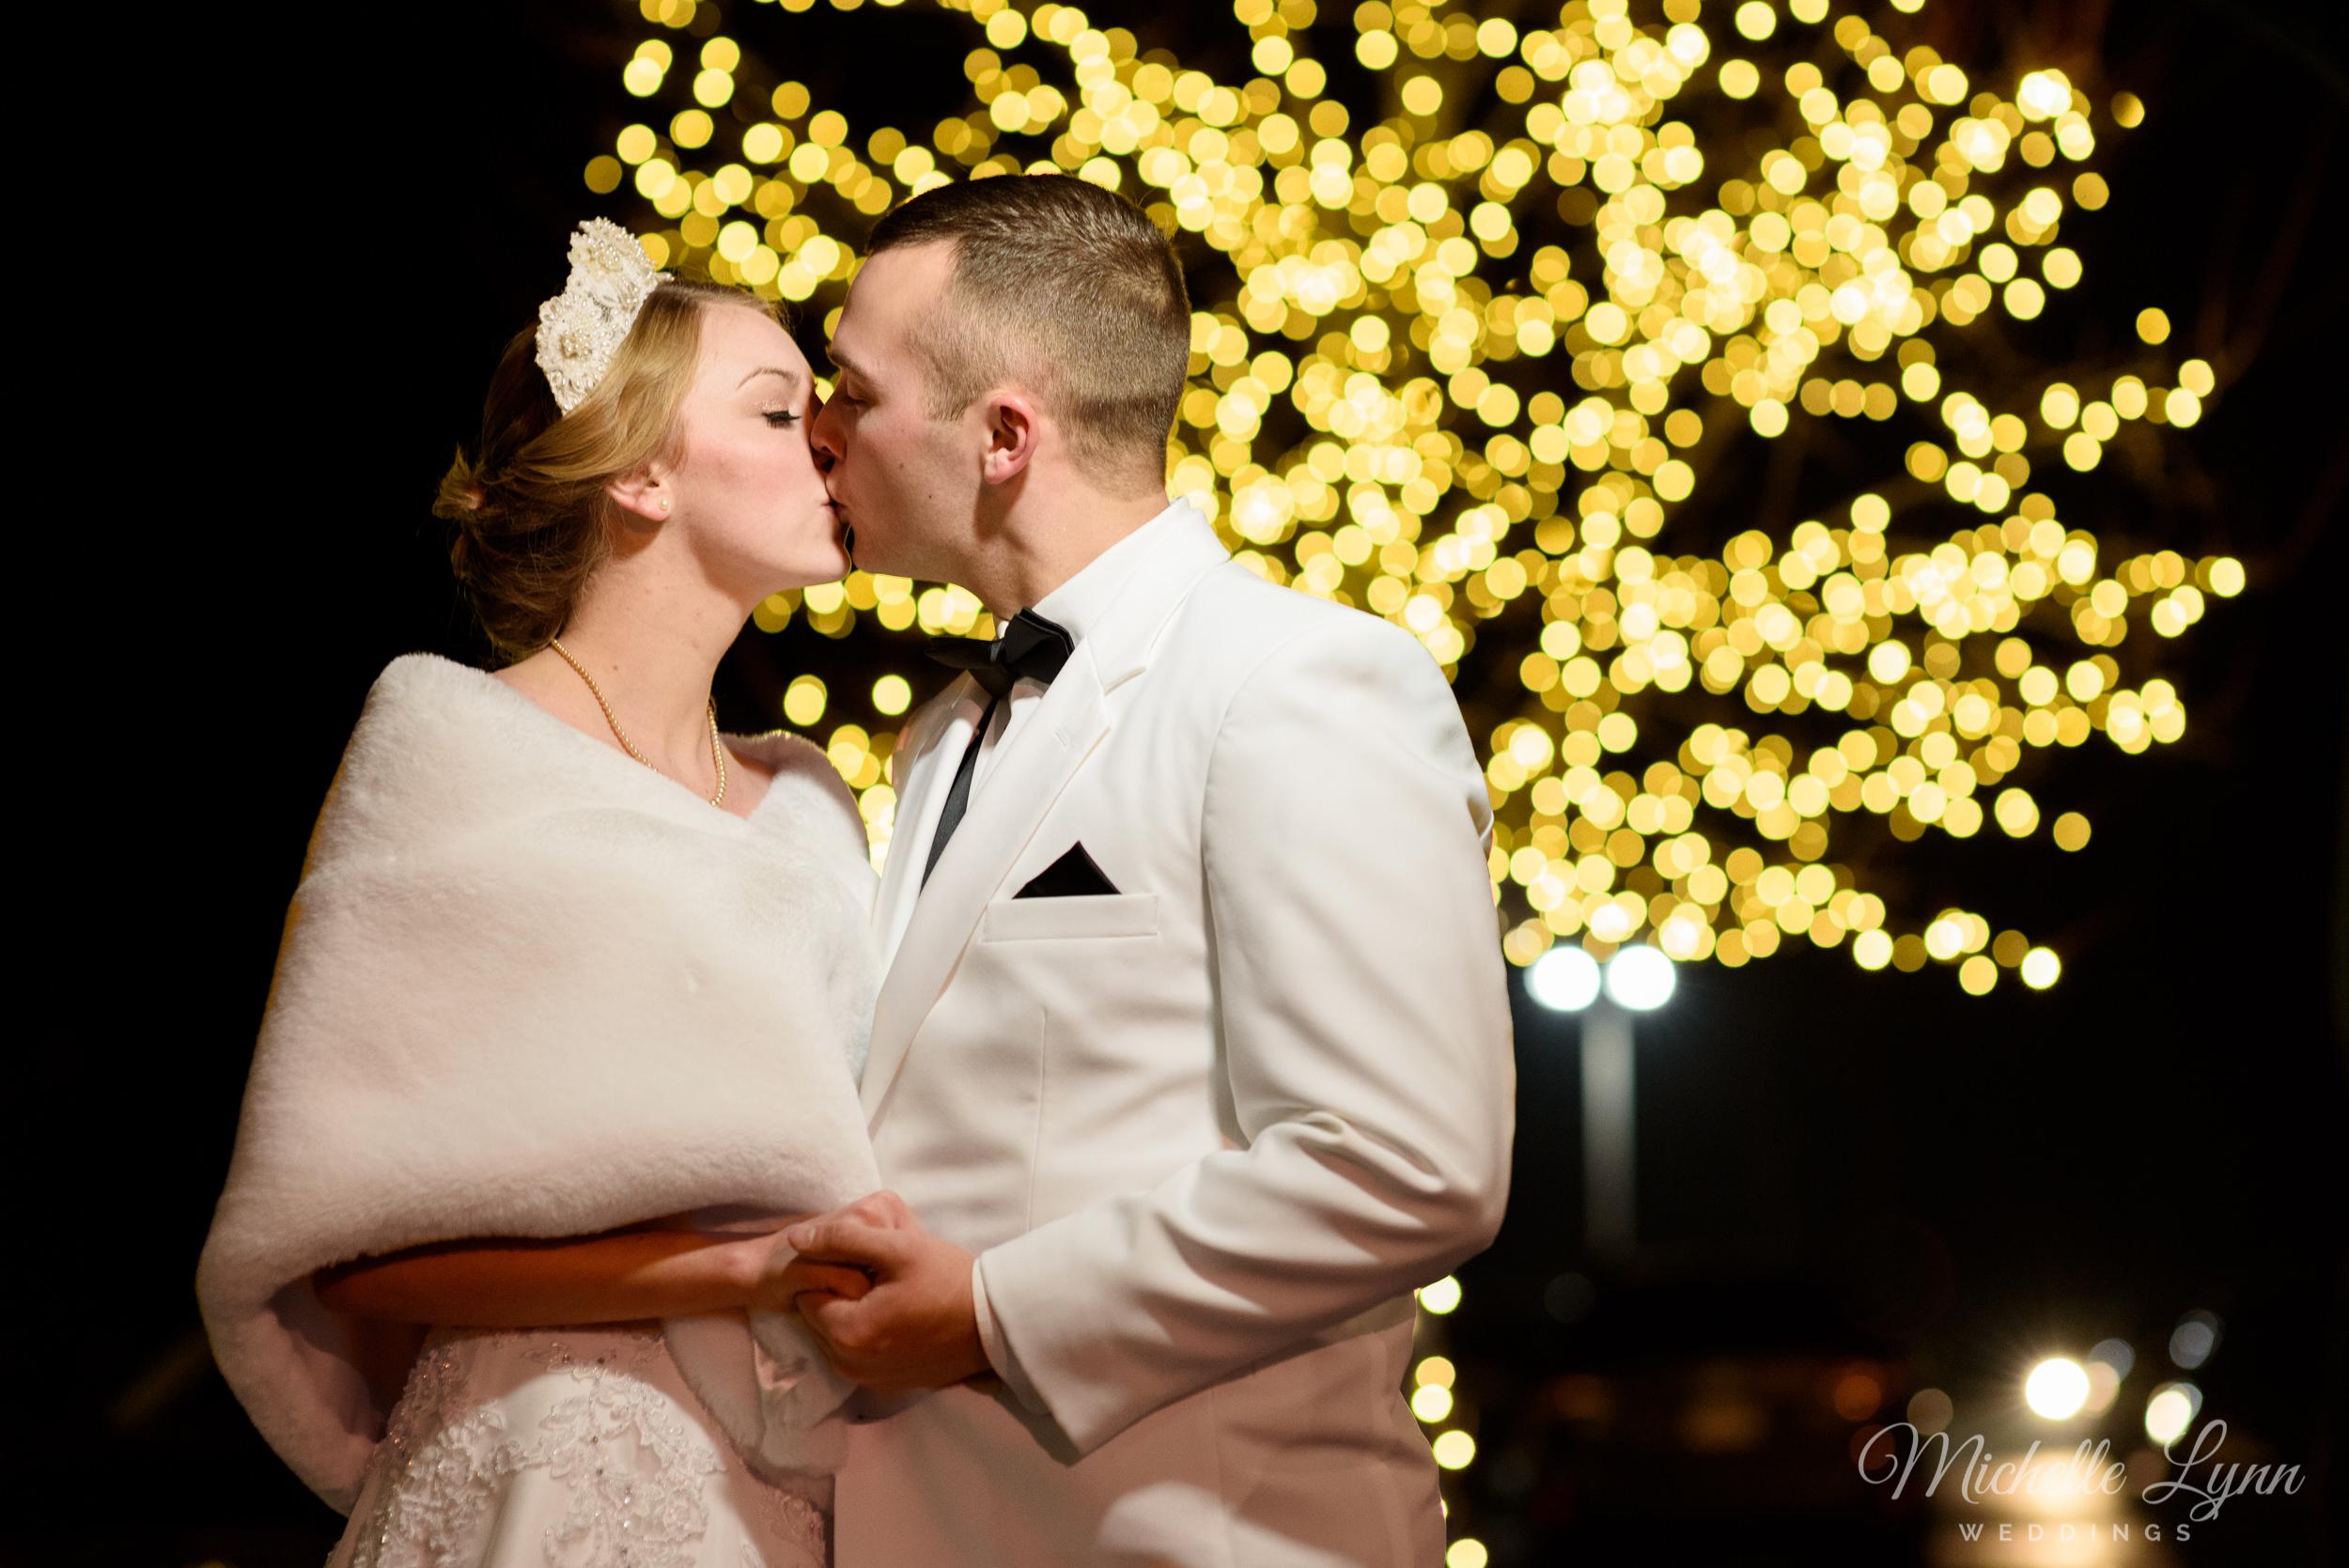 william-penn-inn-wedding-photography-mlw-1.jpg